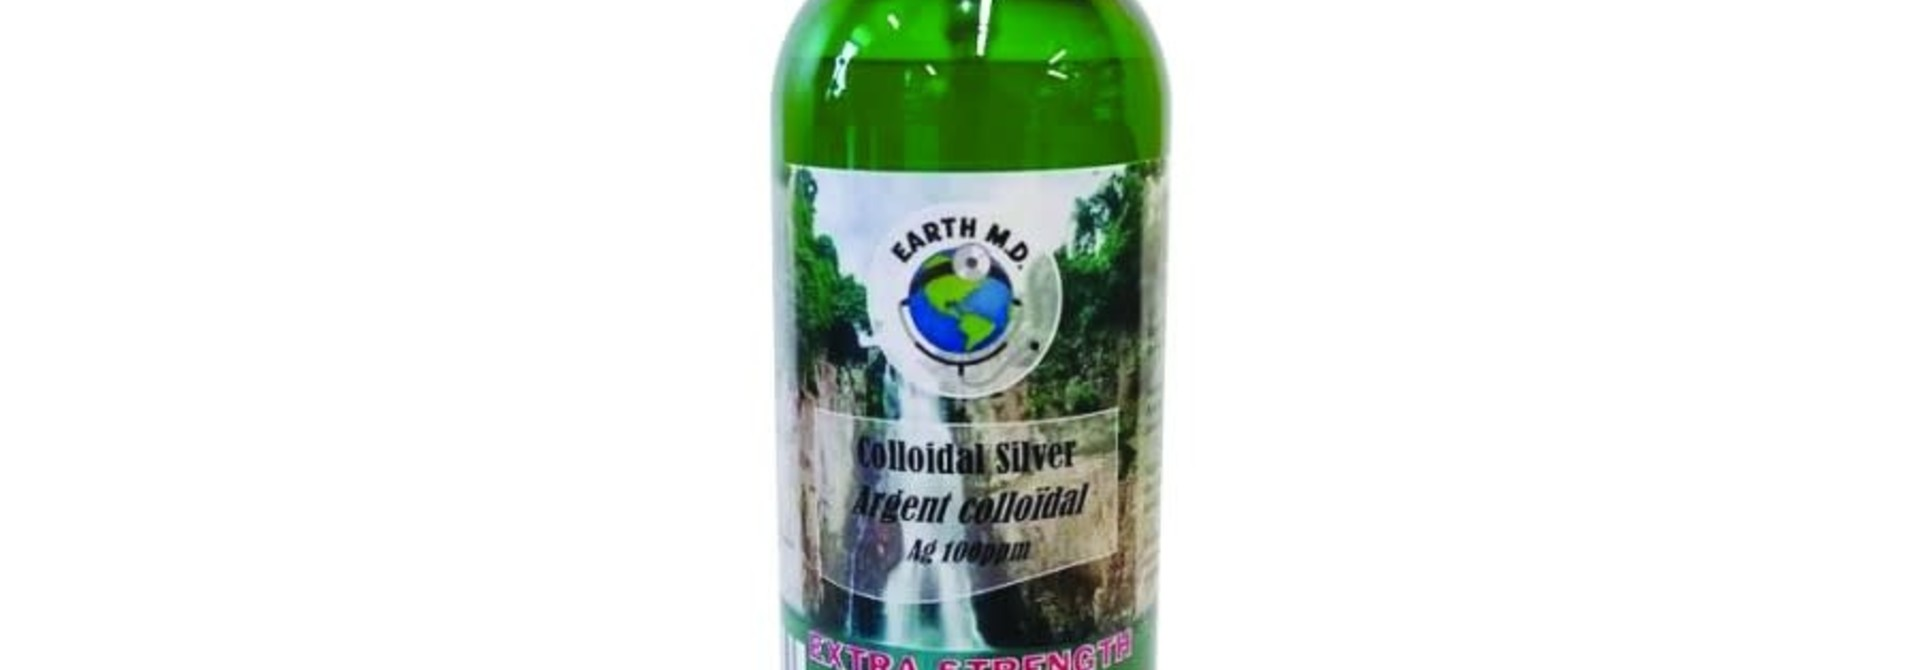 Colloidal Silver Extra Strength Spray 250mL